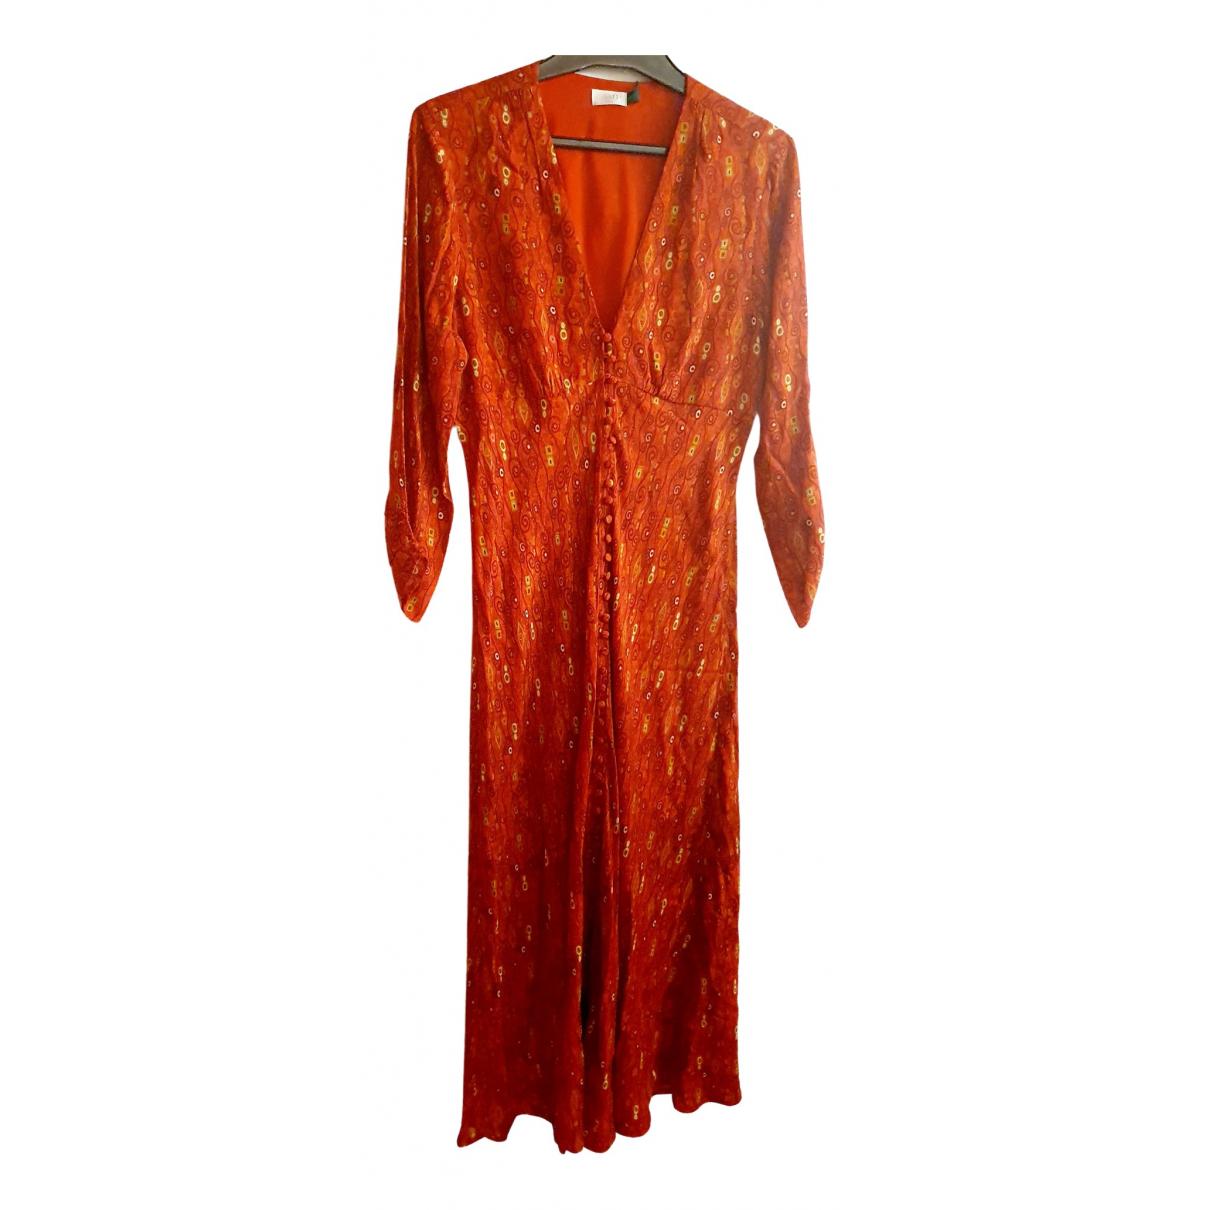 Rixo \N Red dress for Women M International